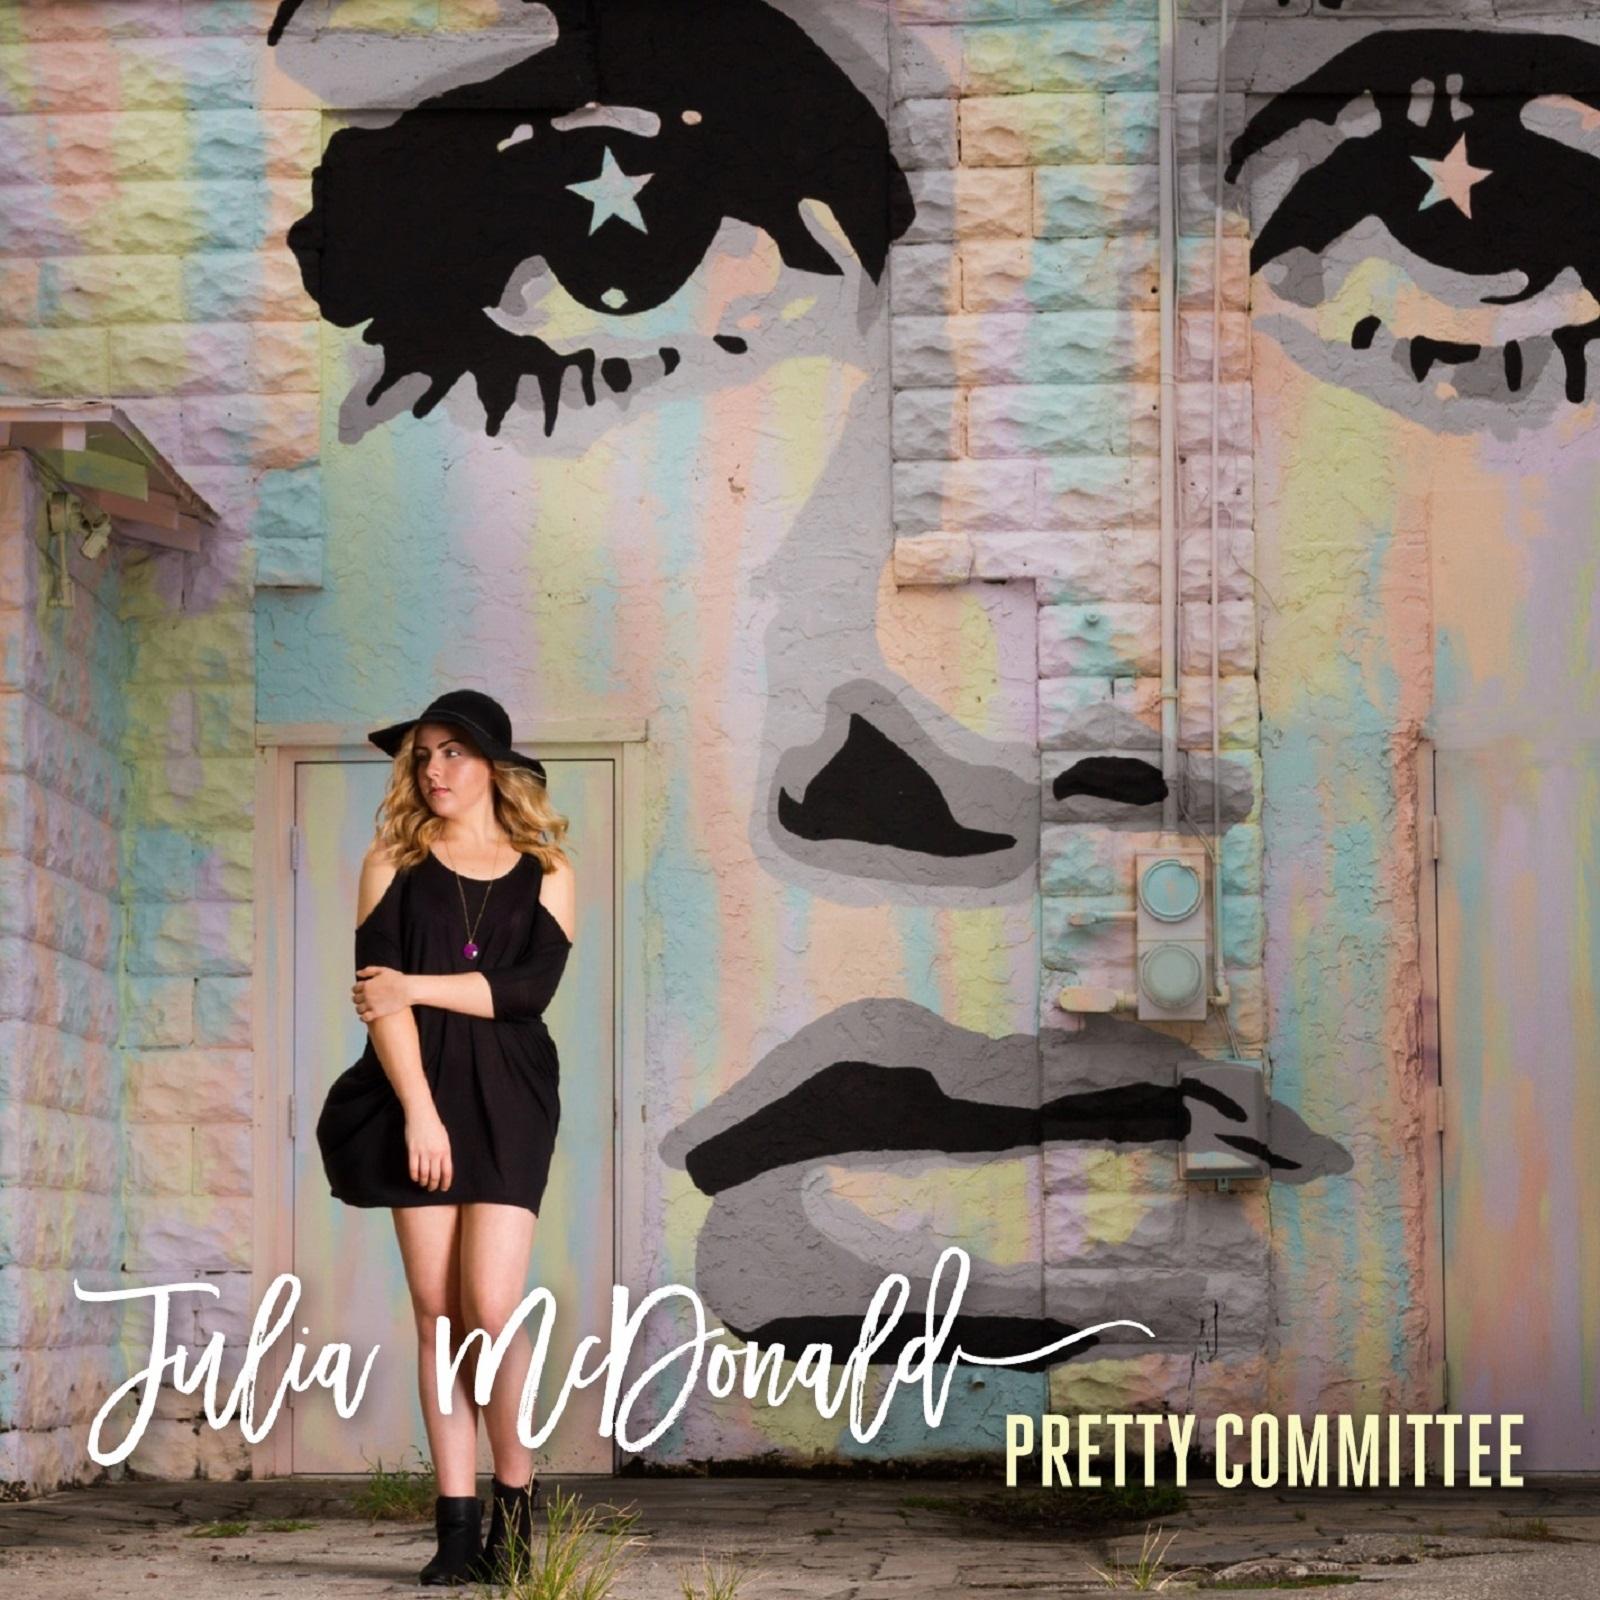 Julia_McDonald_CD_Cover_PrettyCommittee_1600_1600.jpg